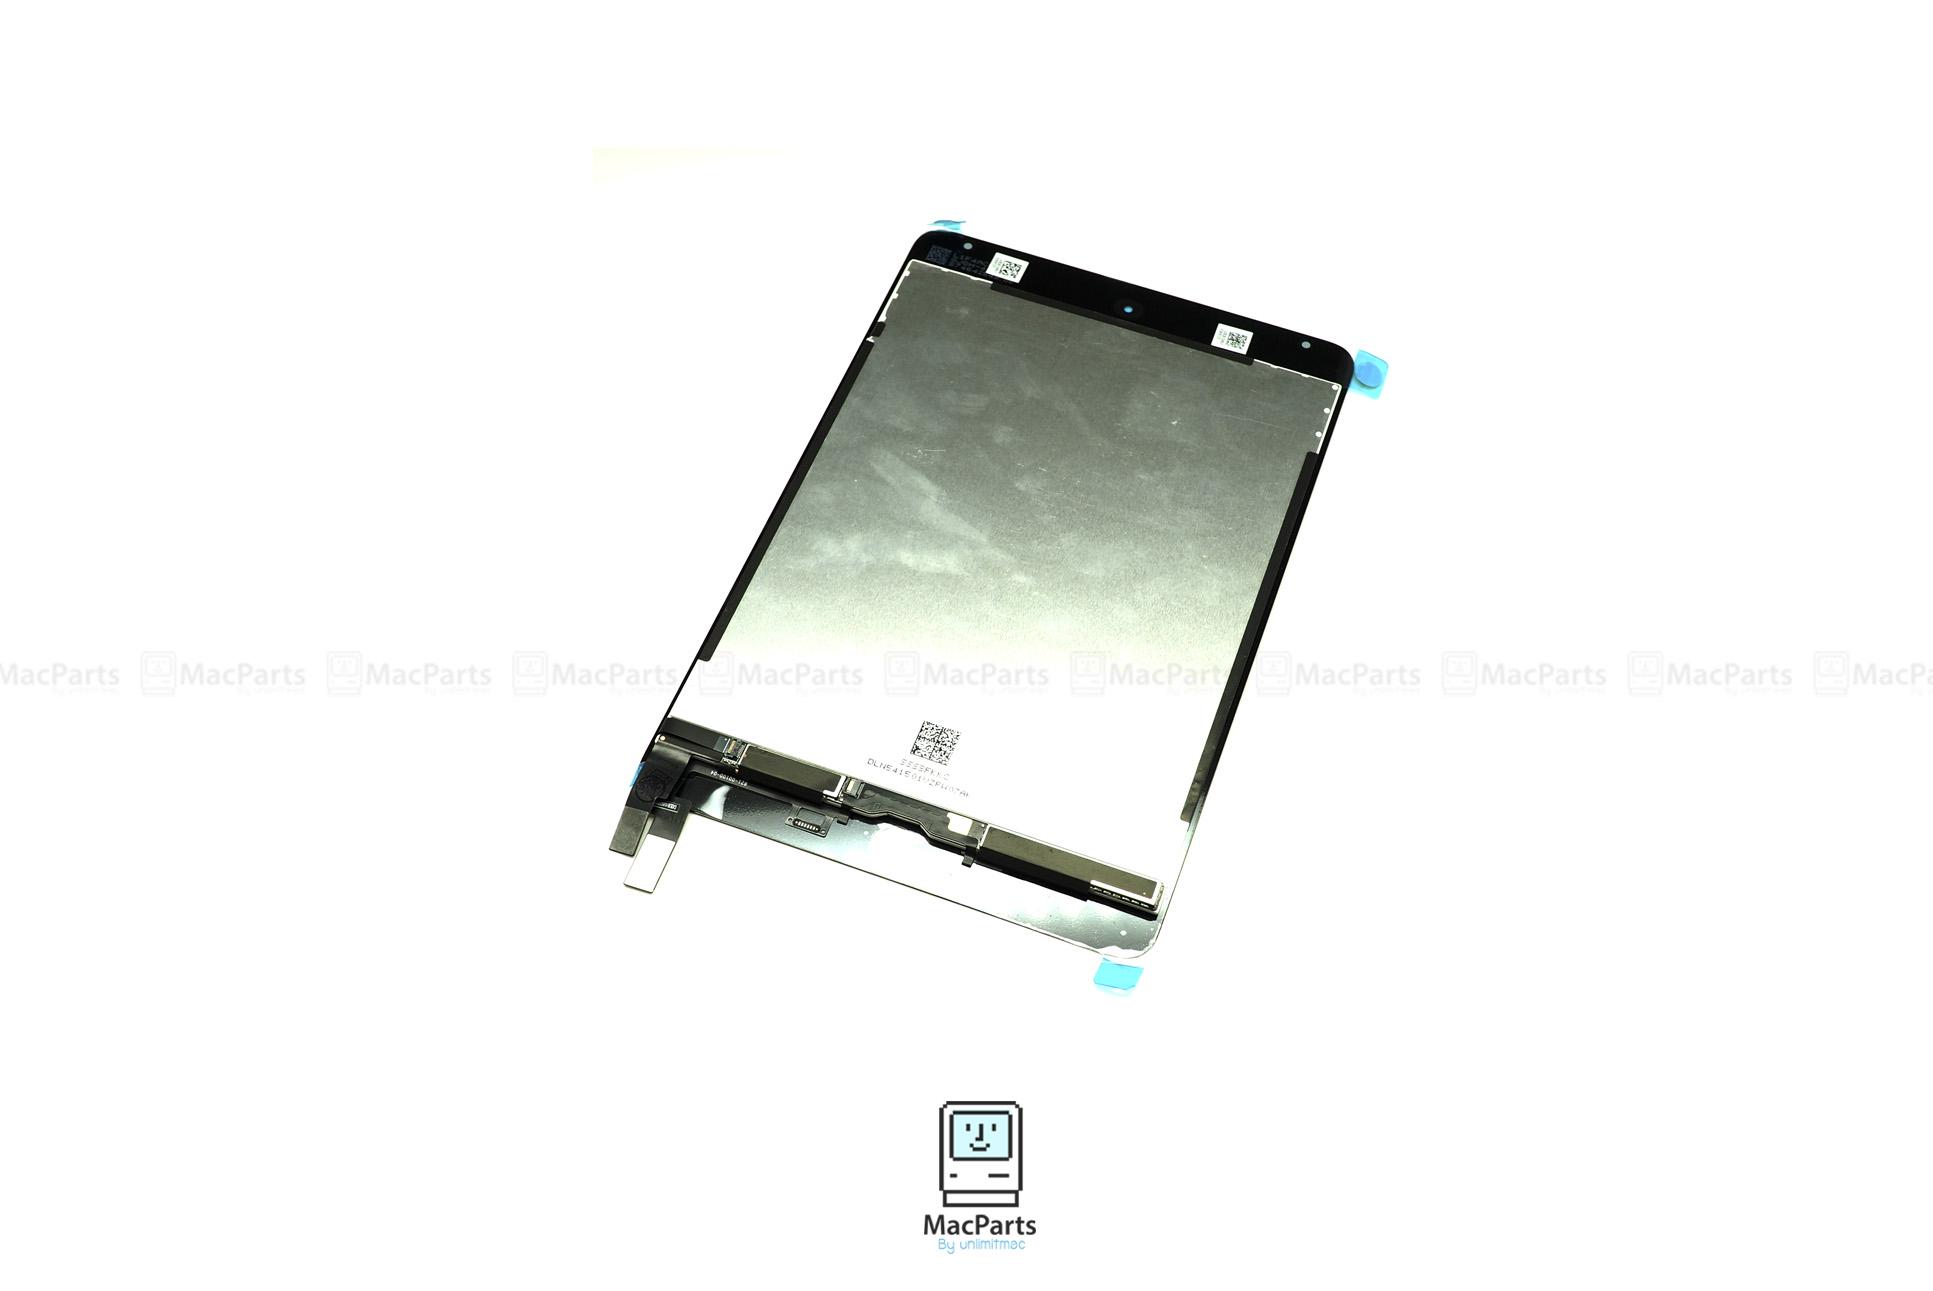 LCD Screen Display with Digitizer Touch Panel iPad mini 4 Black +IC Chip , Touch ID ชุดทัชสกรีน+จอ iPad mini 4 พร้อมชุดปุ่ม โฮม,ทัชไอดี และ IC Chip สำเนา